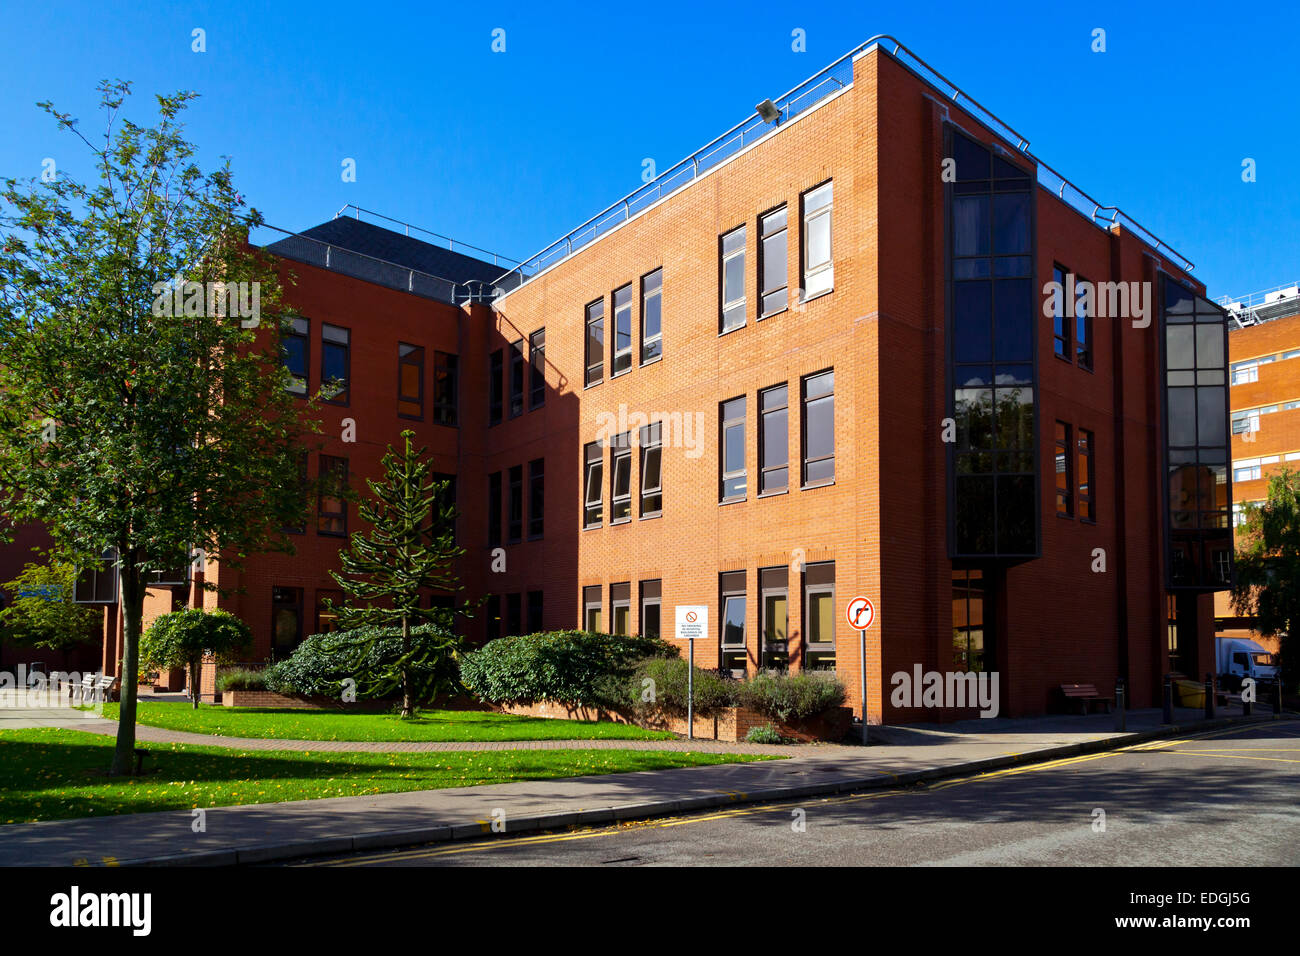 The Leeds Teaching Hospitals NHS Trust hospital building in Leeds West Yorkshire England UK - Stock Image